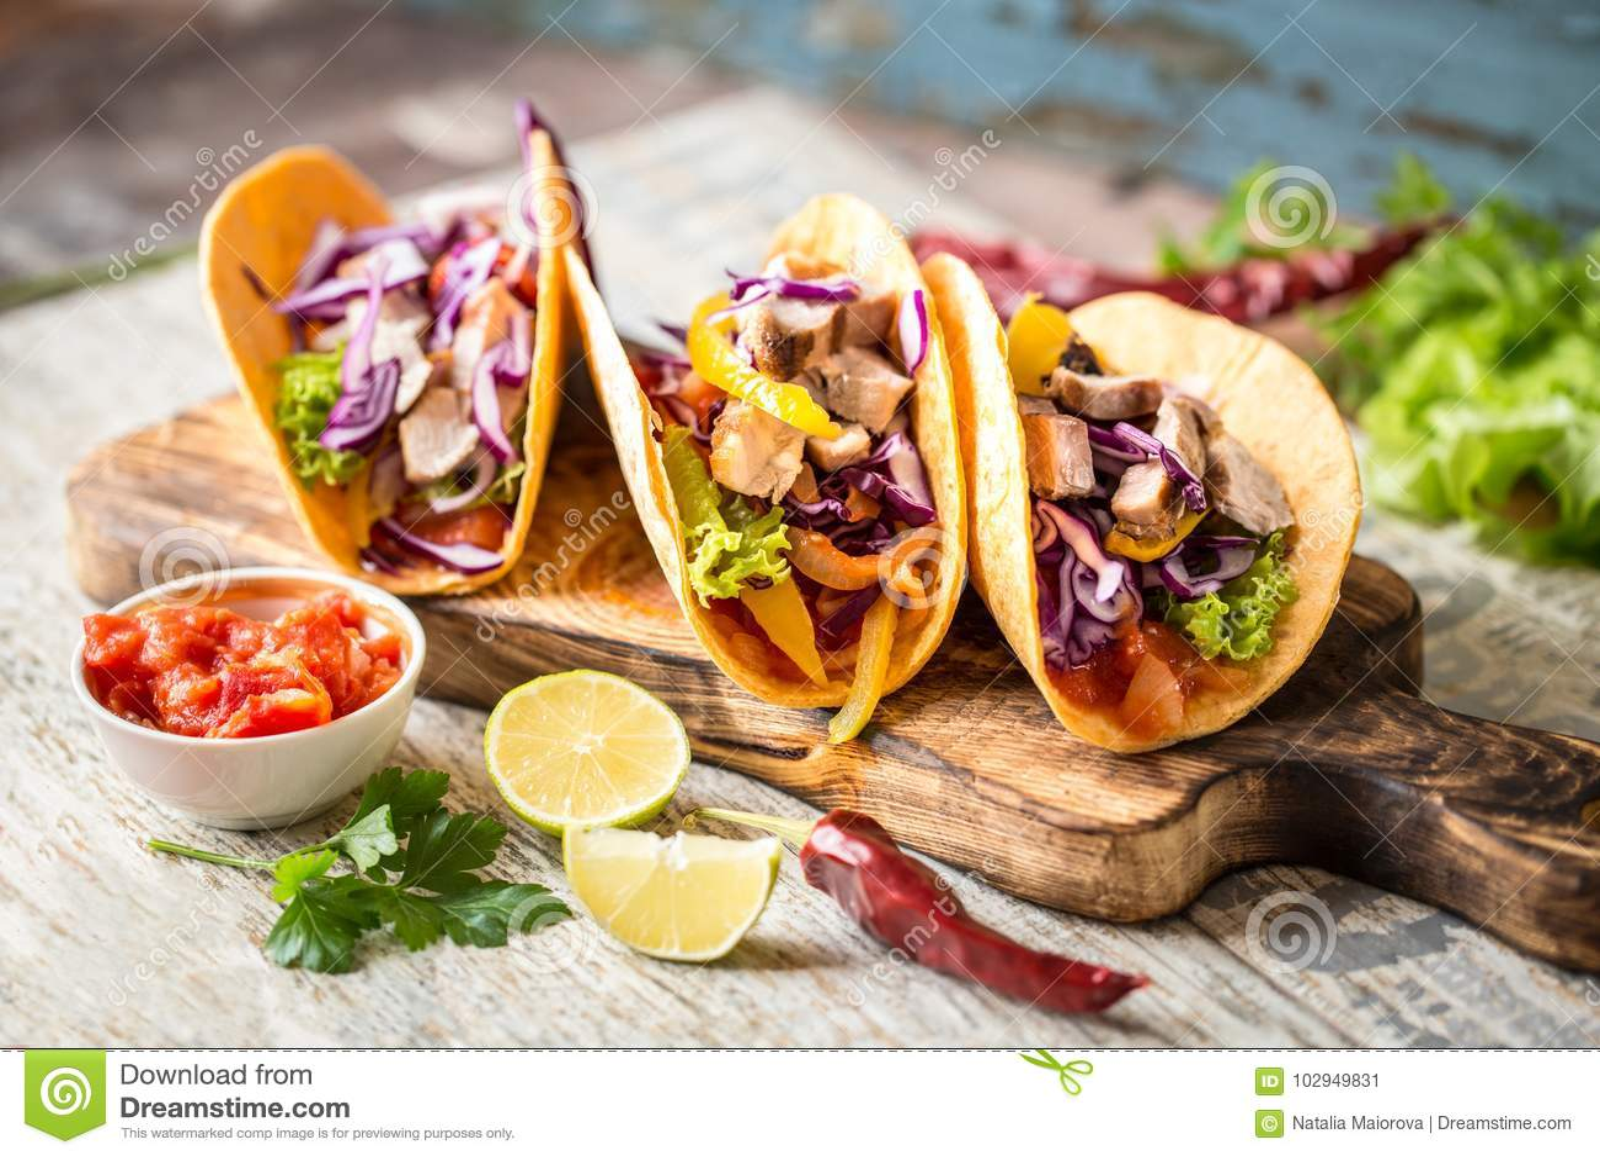 Mexican food tacos, fried chicken, greens, mango, avocado, pepper, salsa